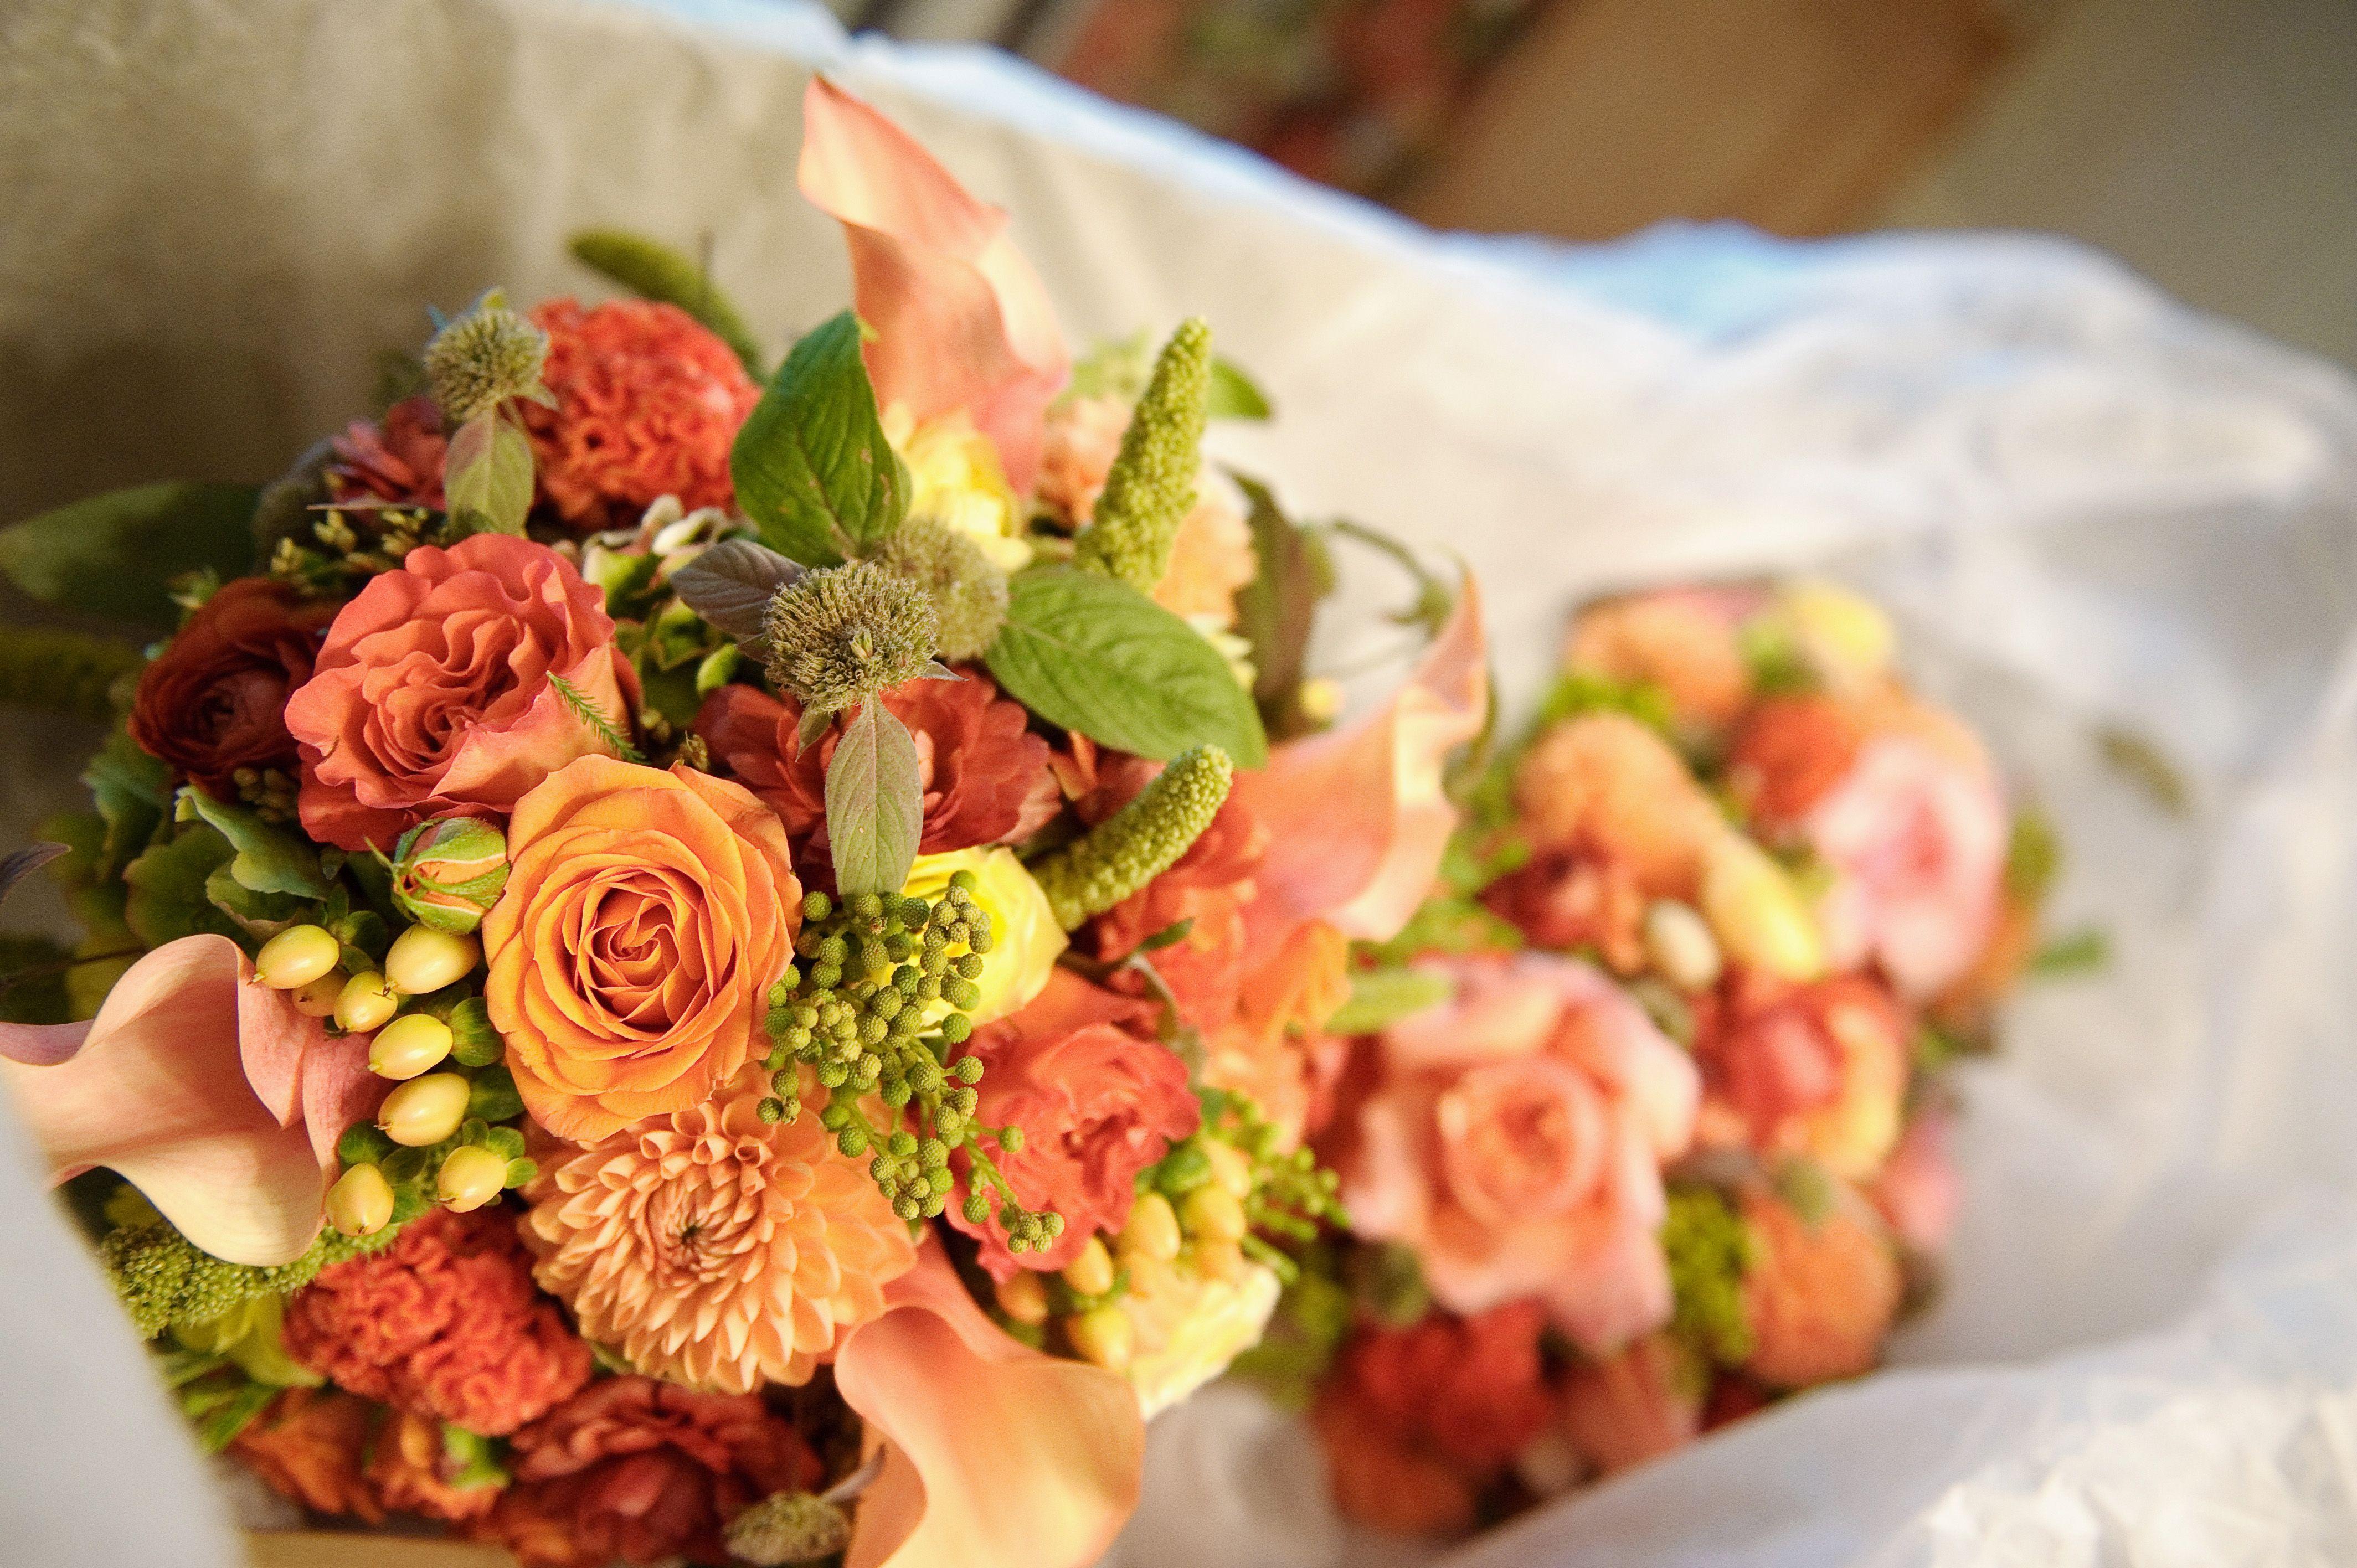 Breathtaking bouquets